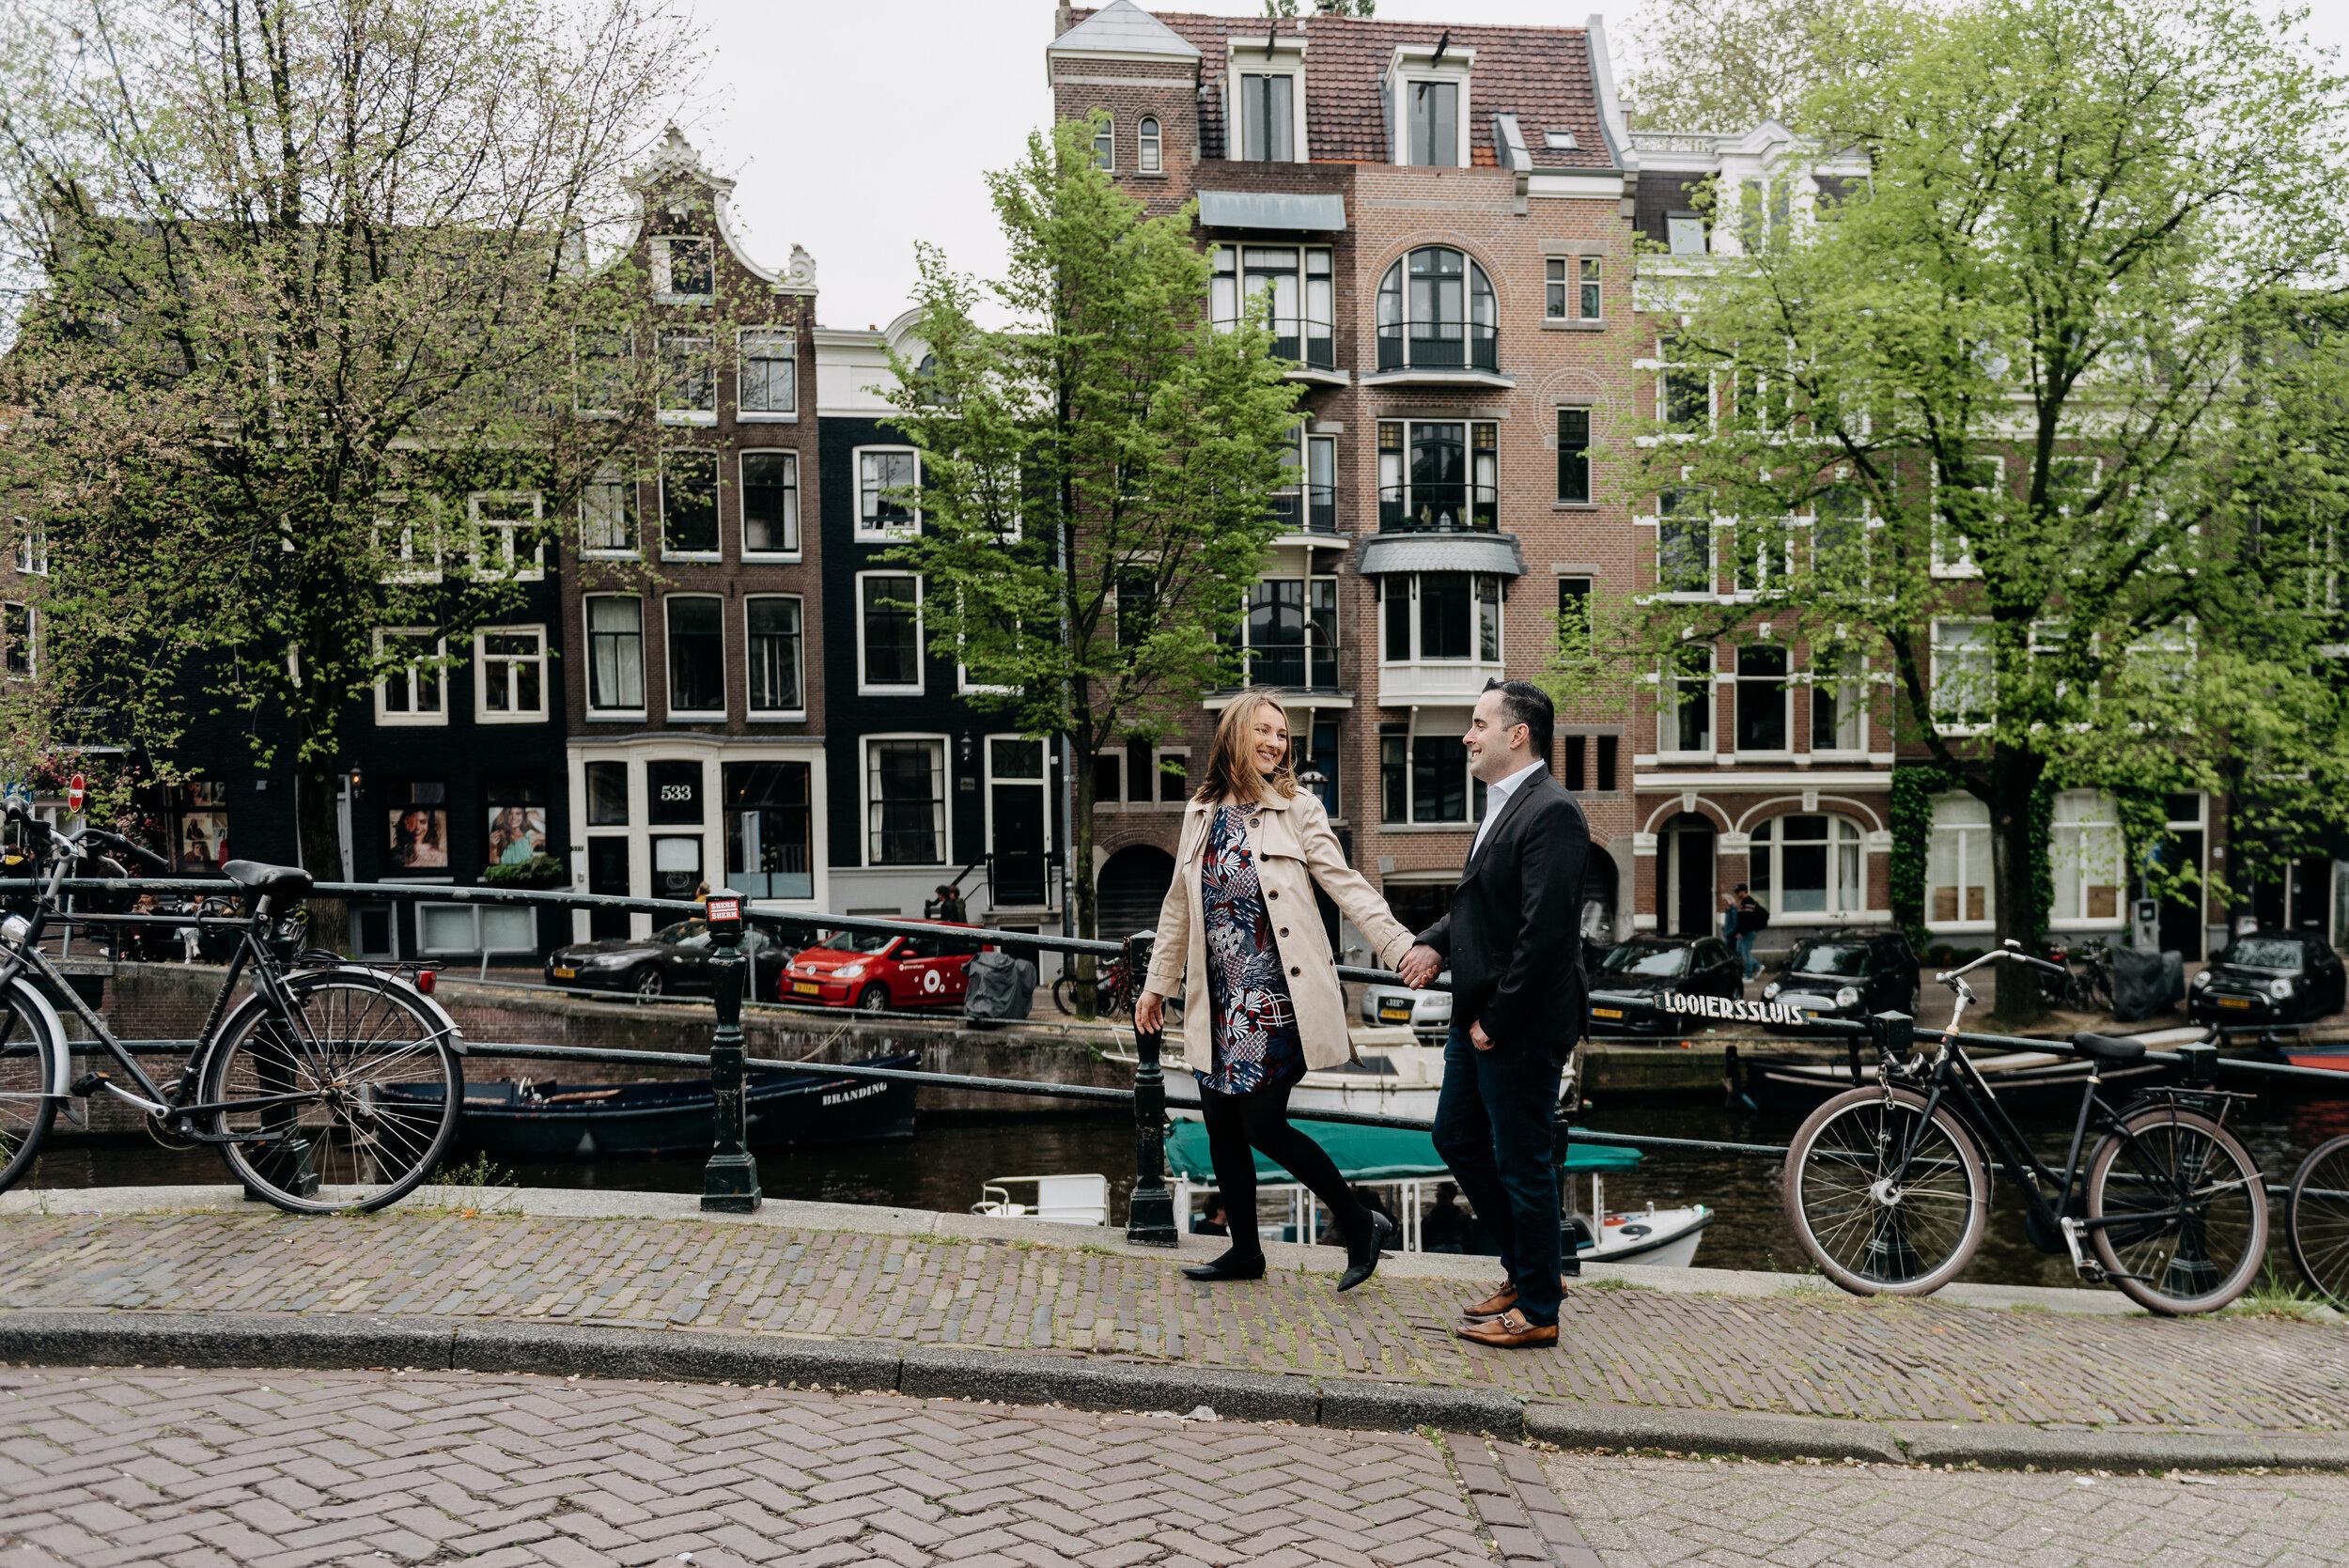 Ensaio Fotografico em Amsterda 10.jpg